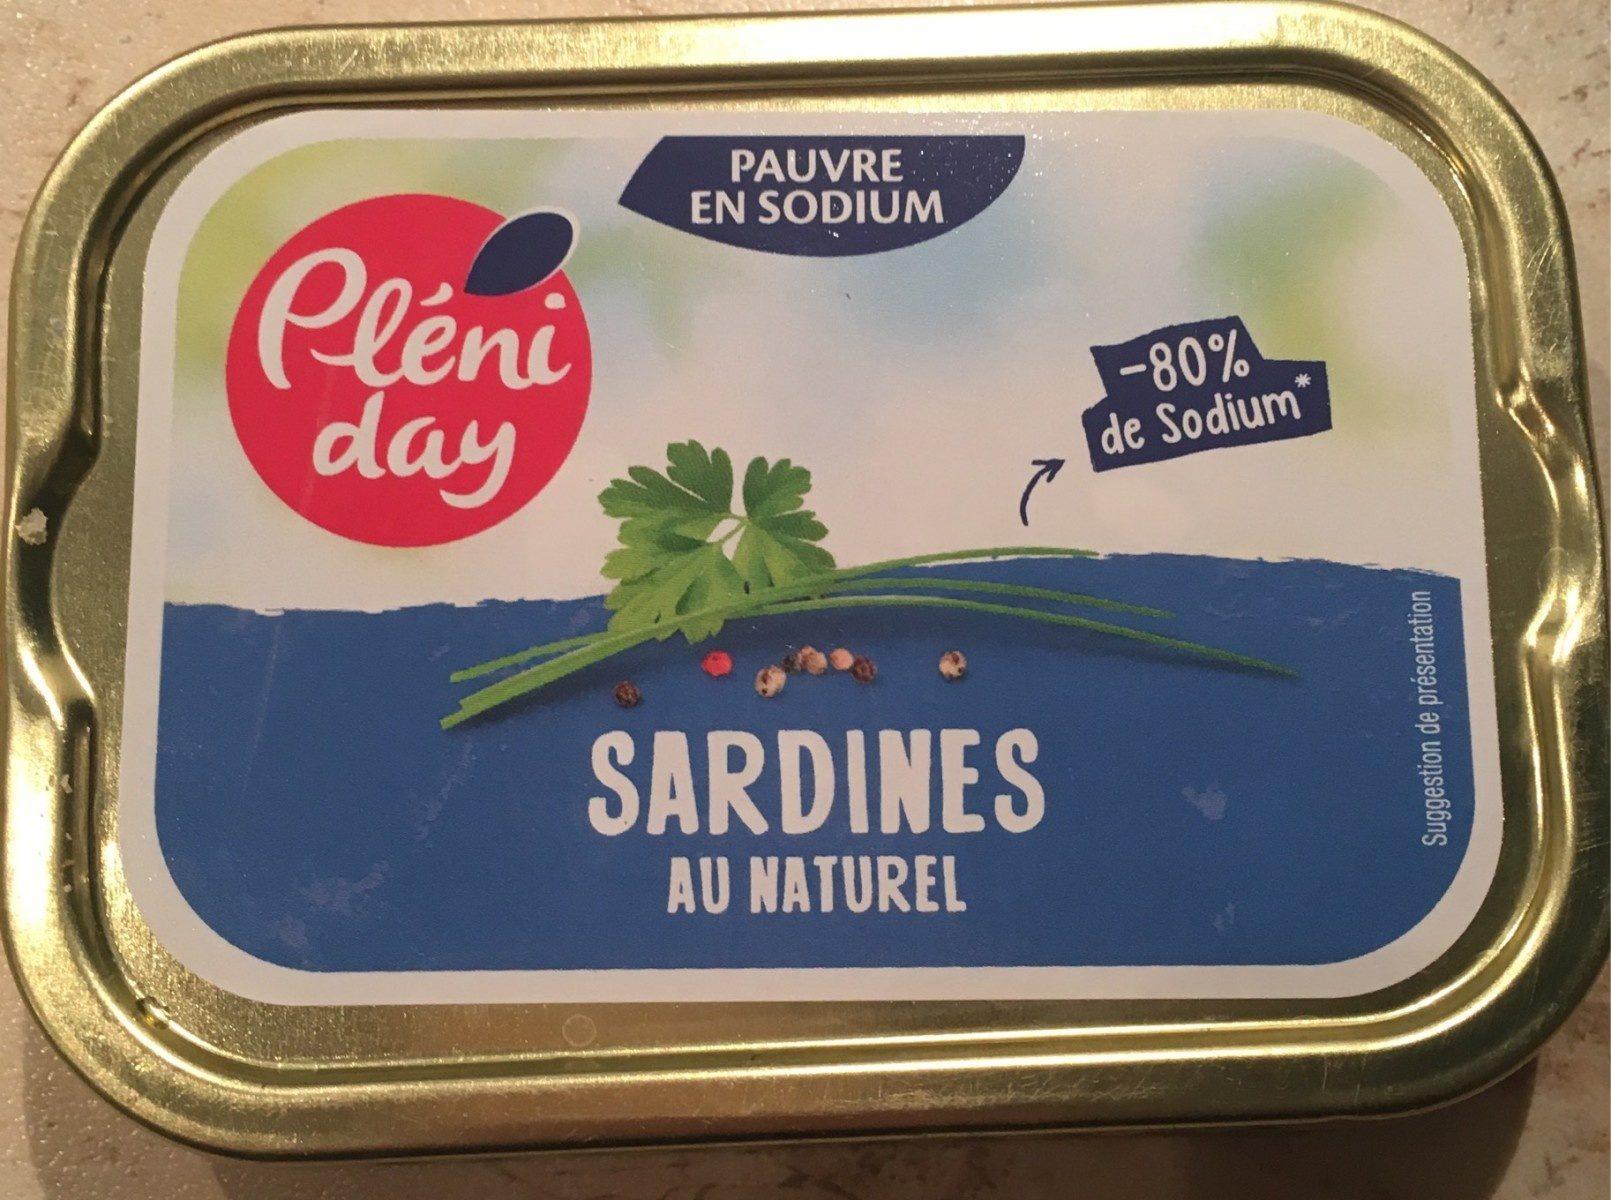 Sardines au naturel - Product - fr